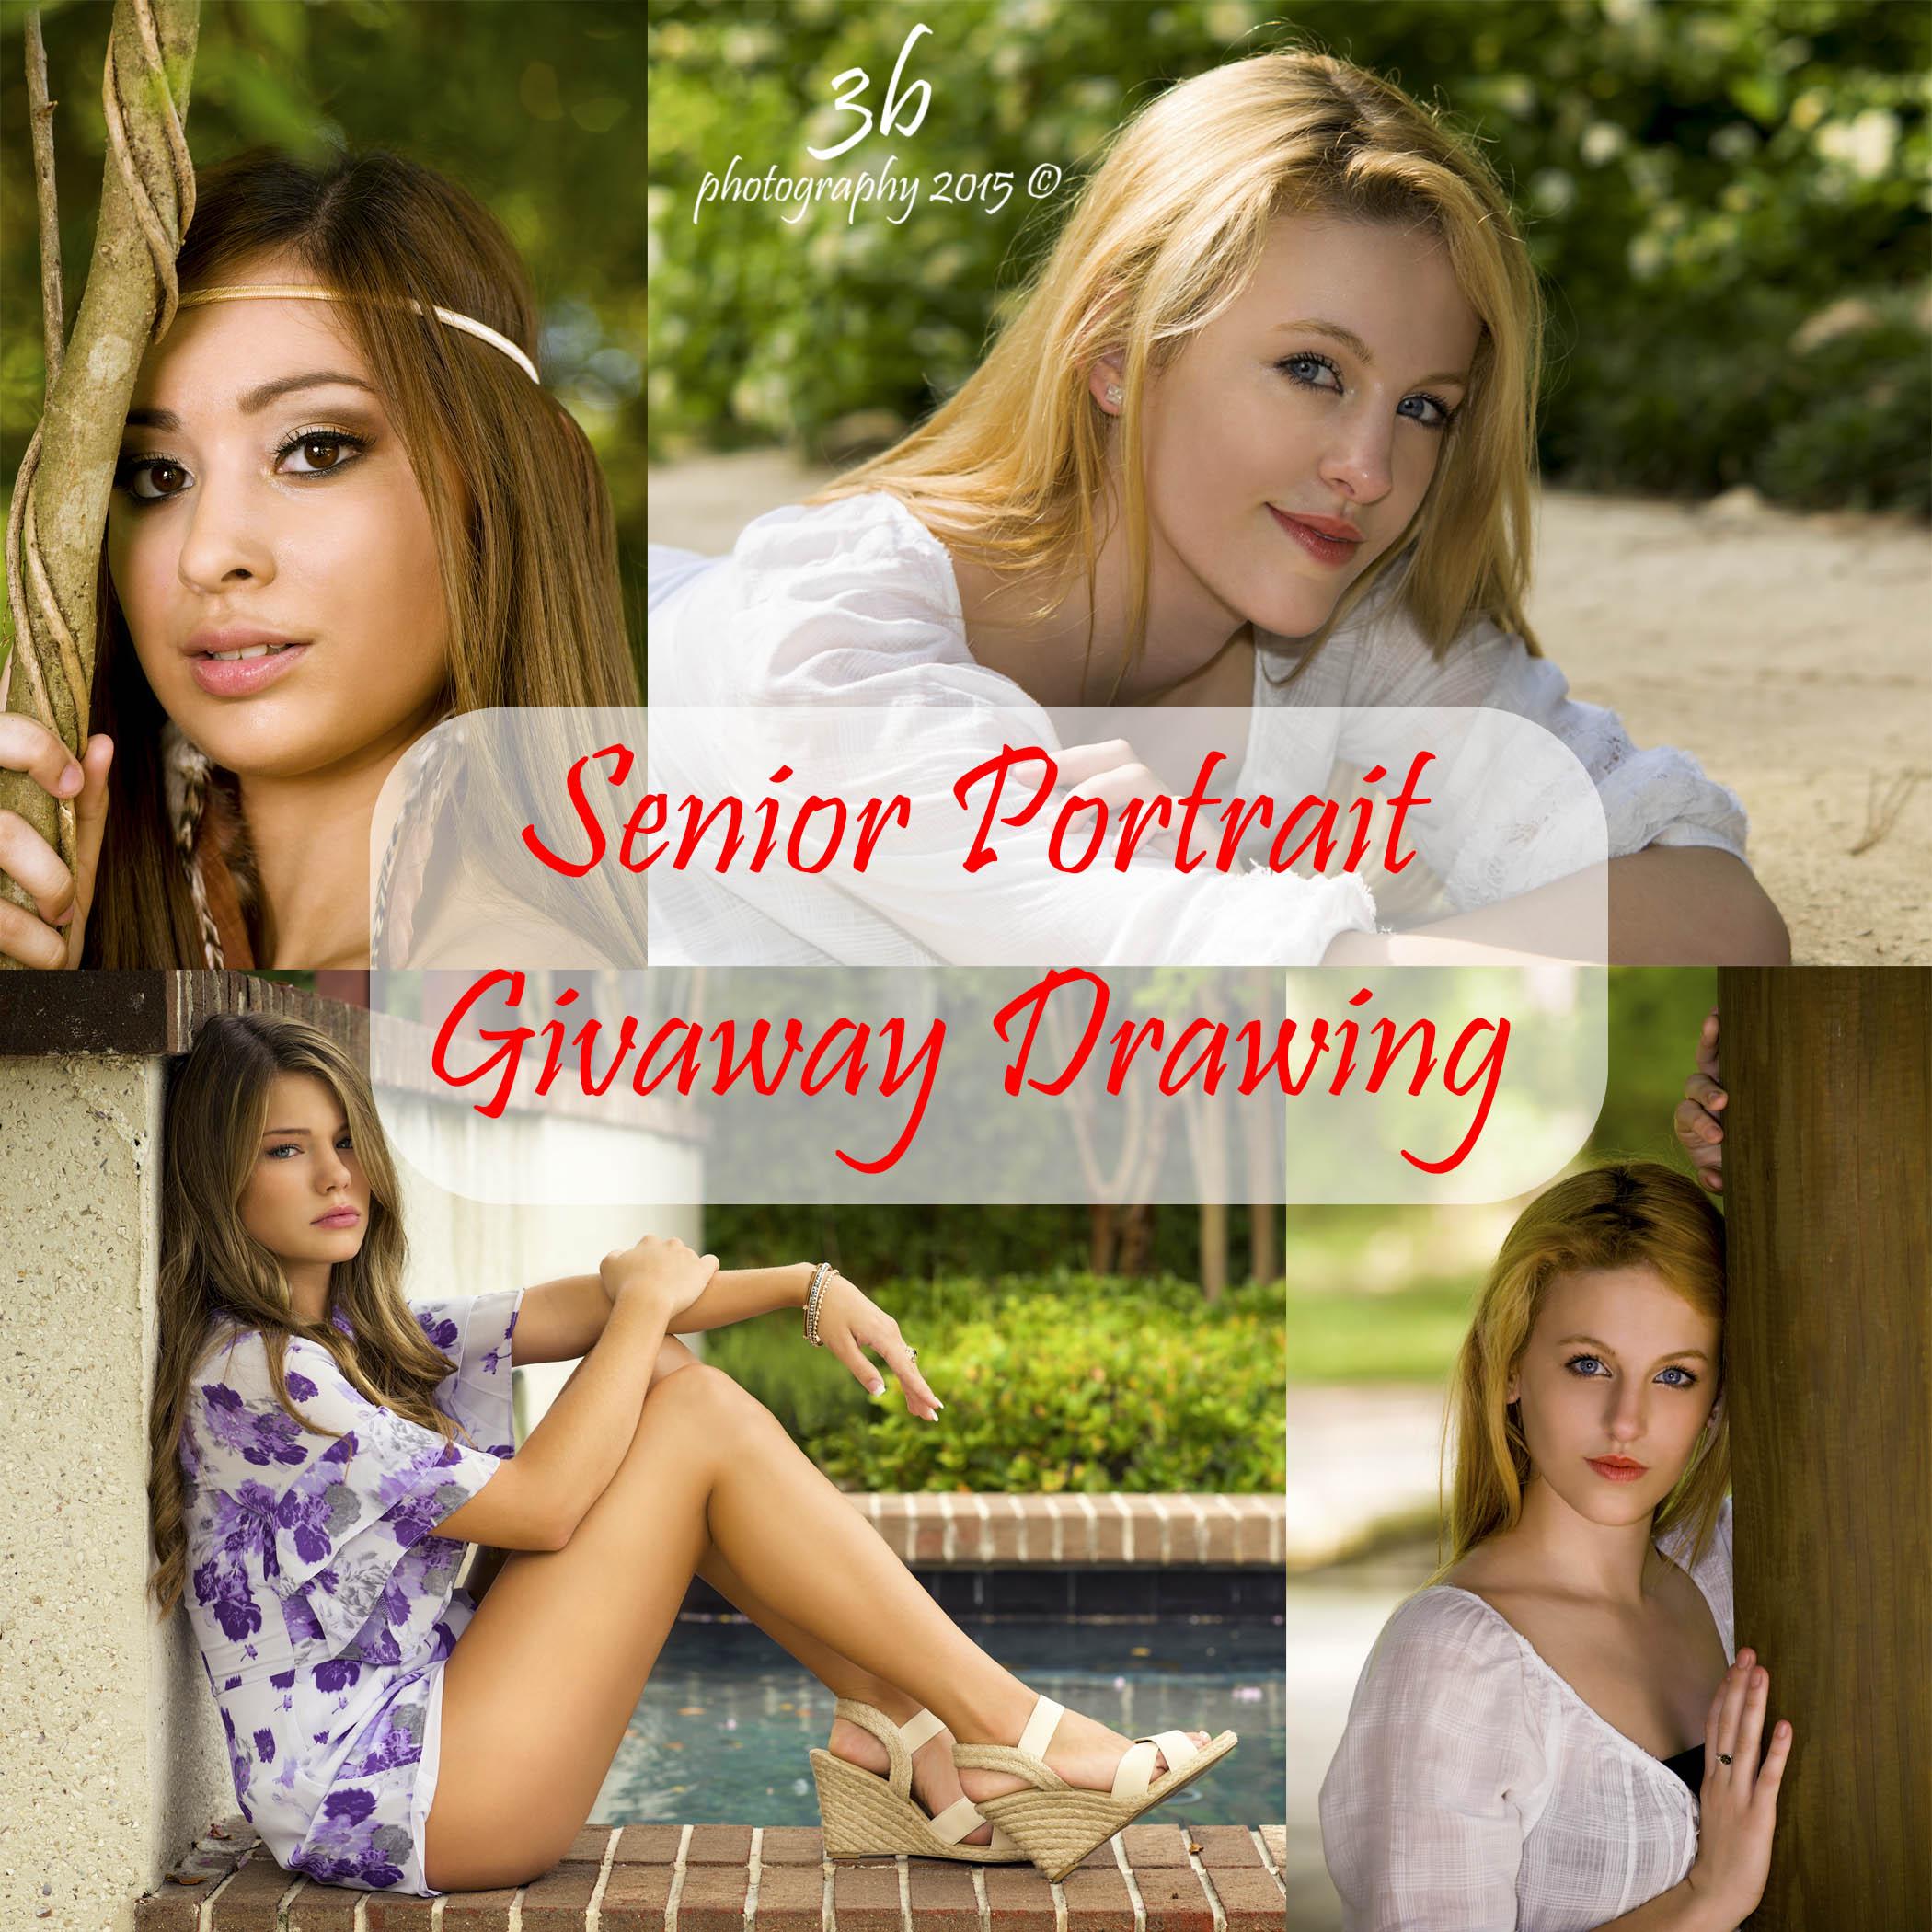 Senior Portrait Drawing